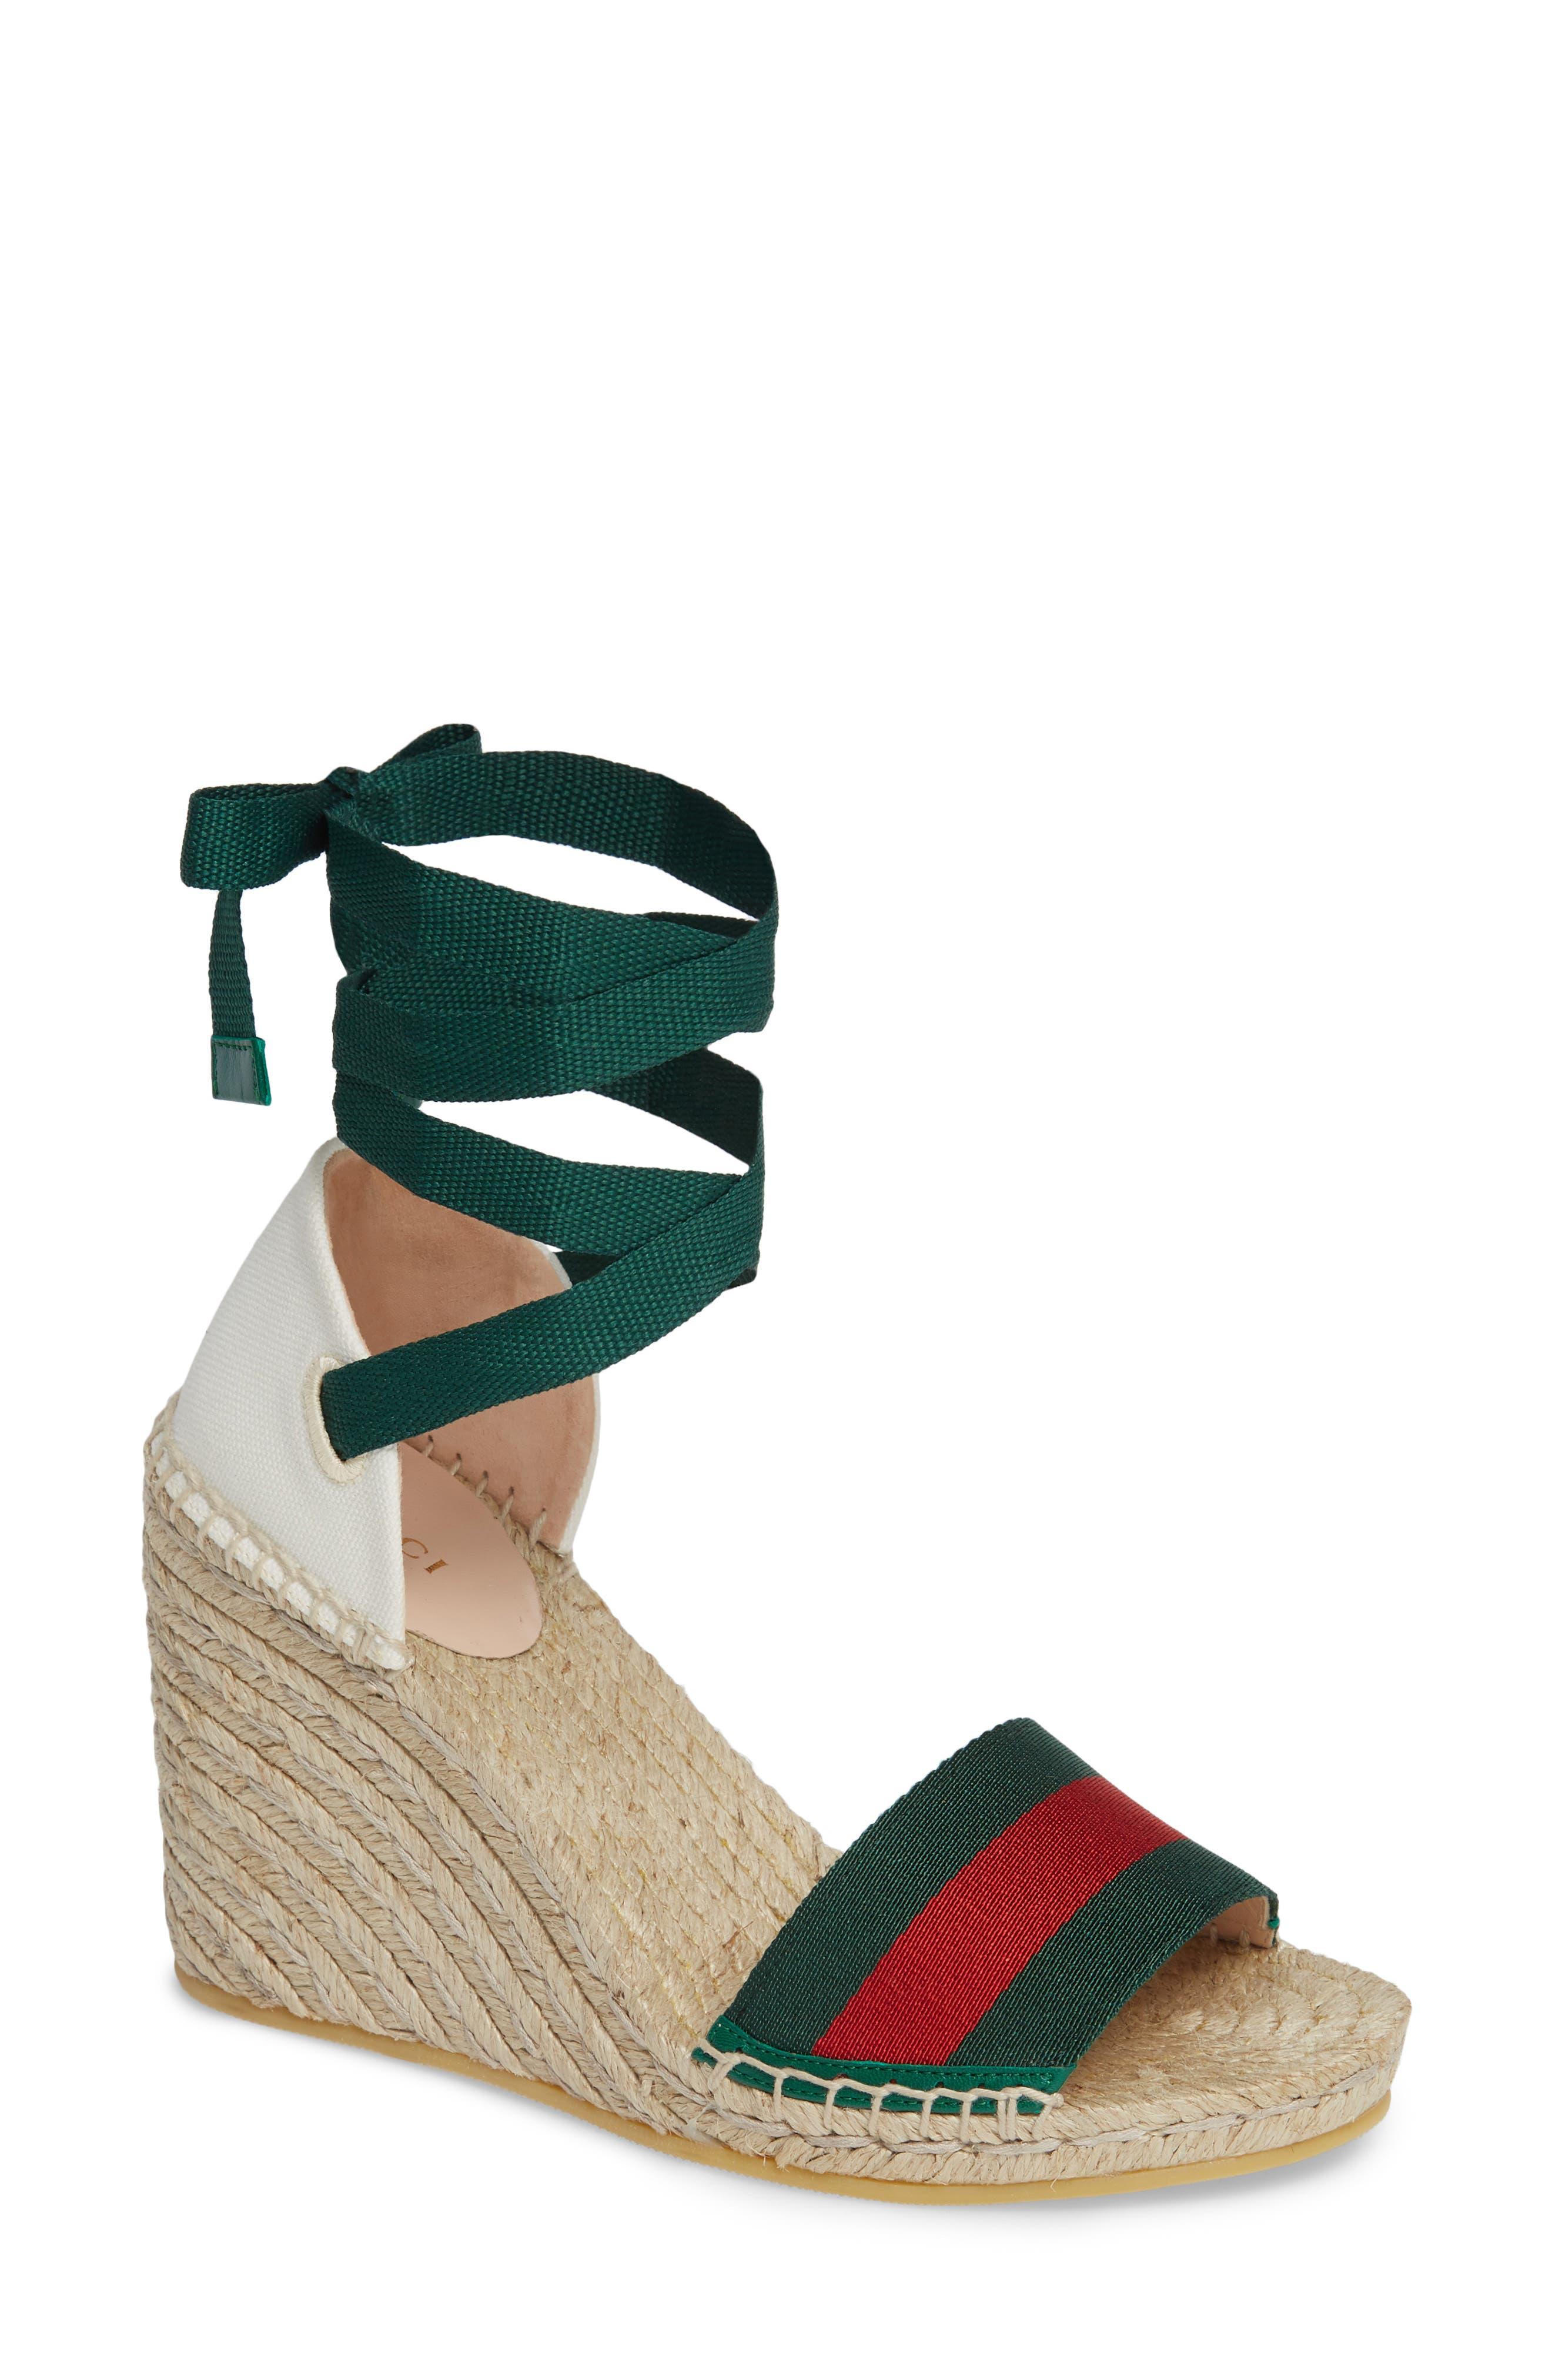 GUCCI, Lilibeth Sylvie Web Espadrille Wedge Sandal, Main thumbnail 1, color, WHITE/ GREEN